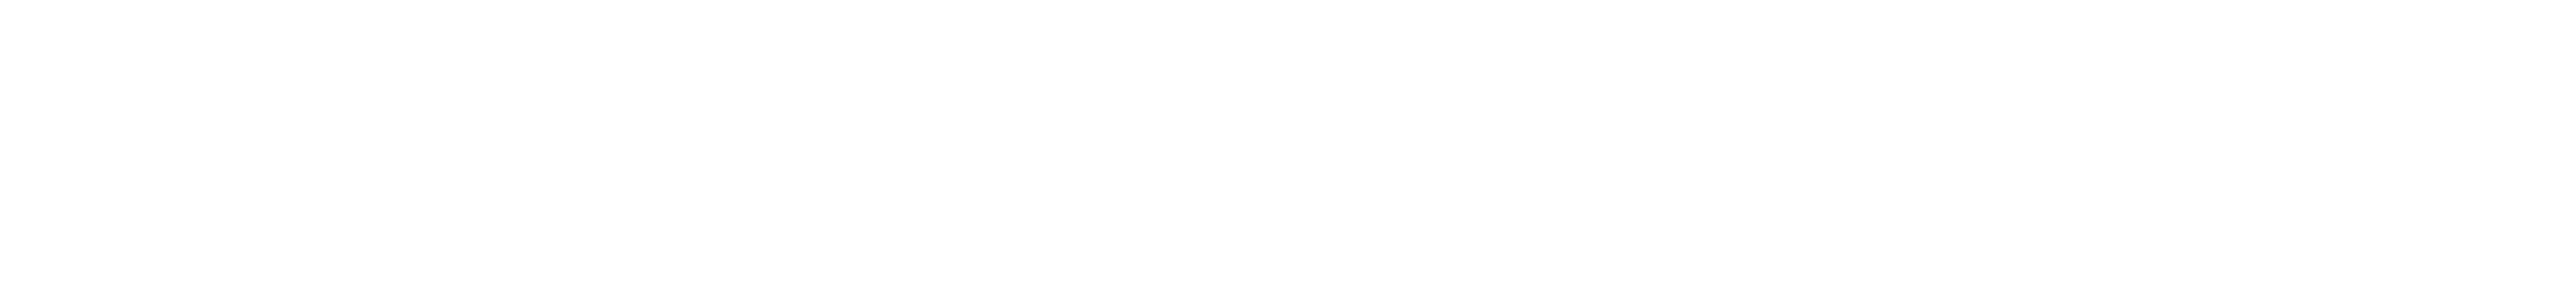 Brandwidth™ | A Podcast About Marketing